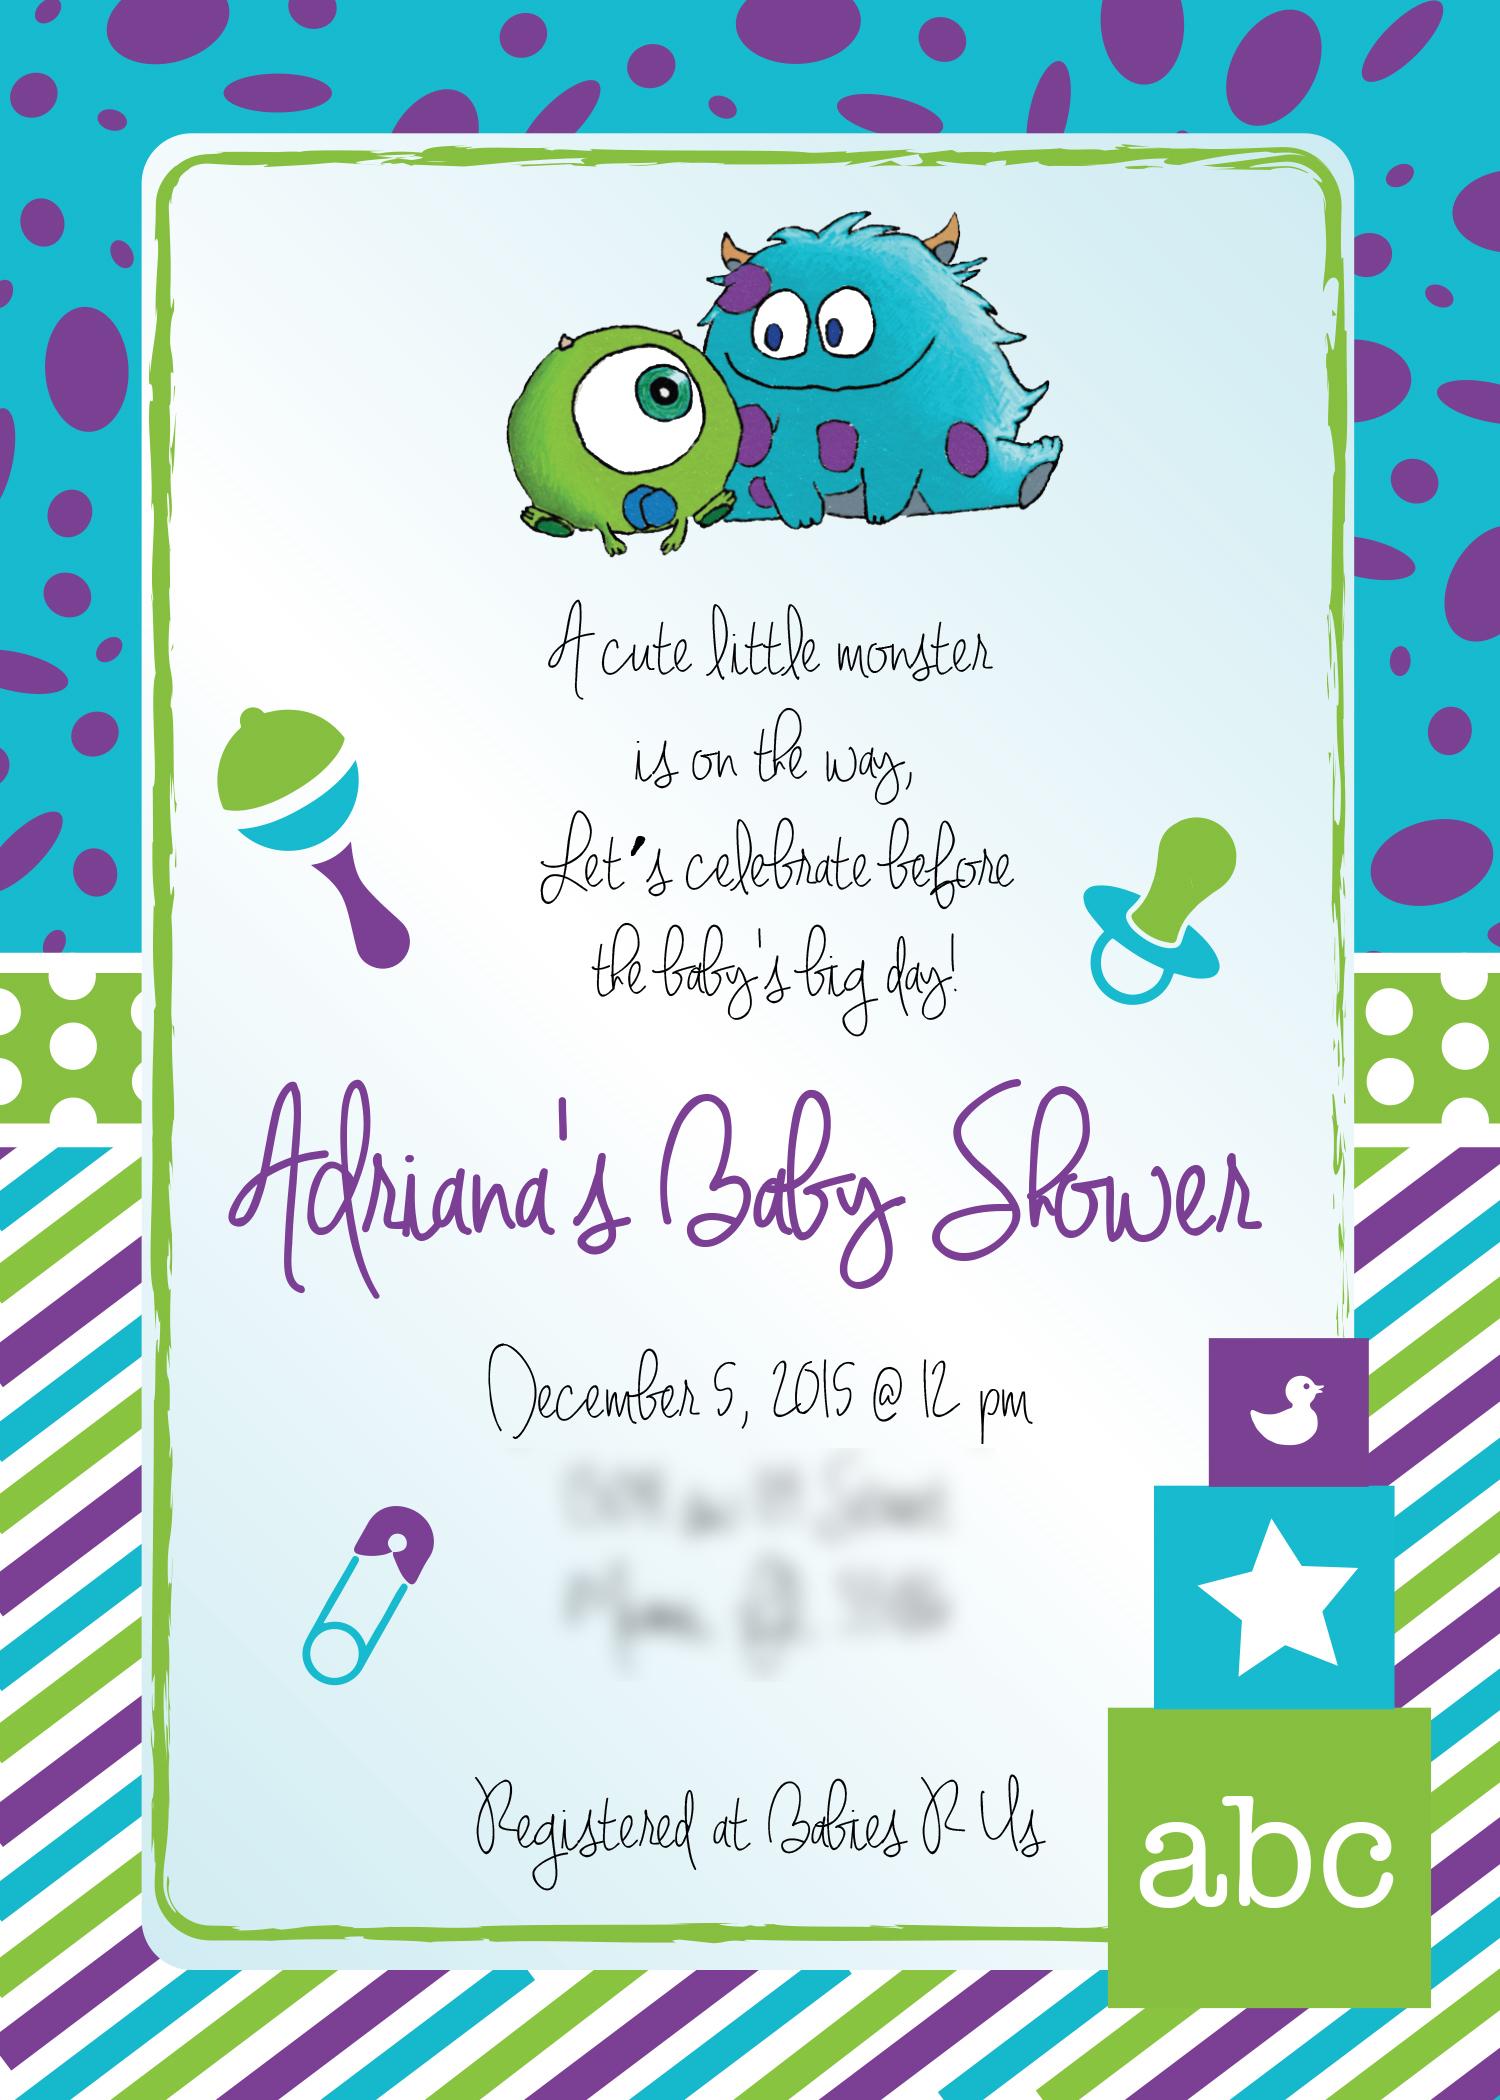 Vinny_BabyShowerInvite.jpg